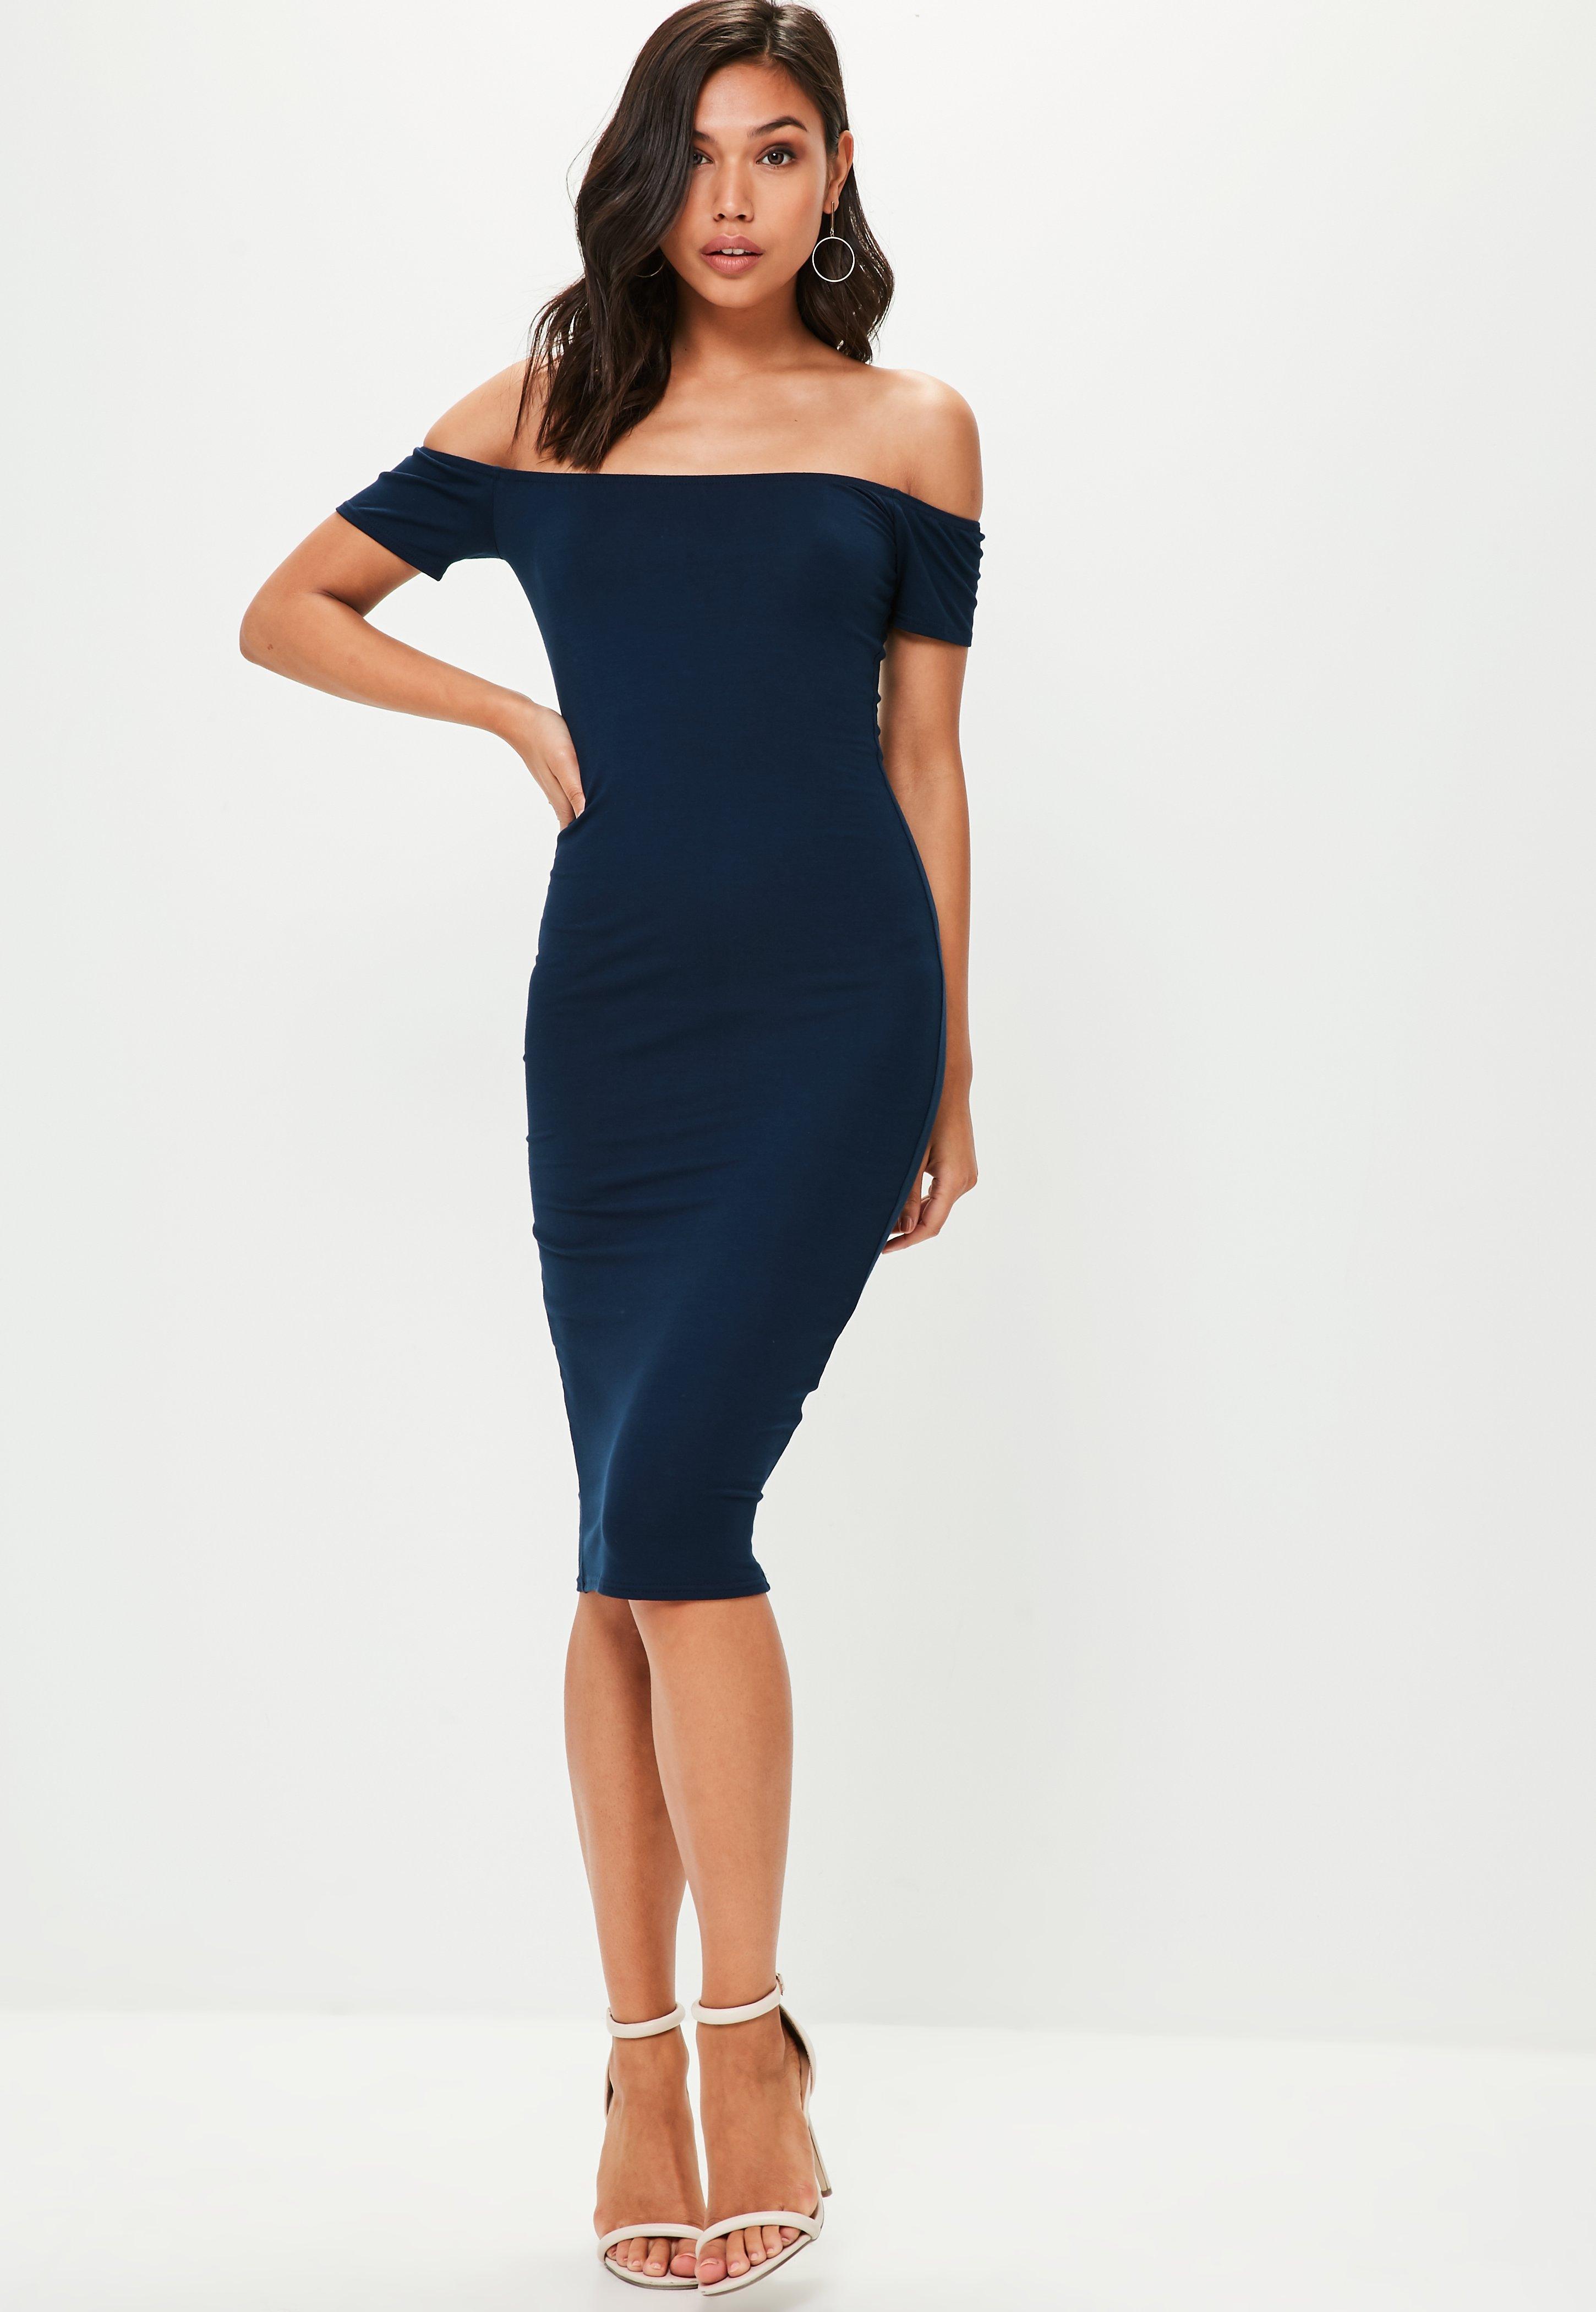 navy blue dress blue dress - navy, light u0026 royal blue dresses | missguided agzdtde